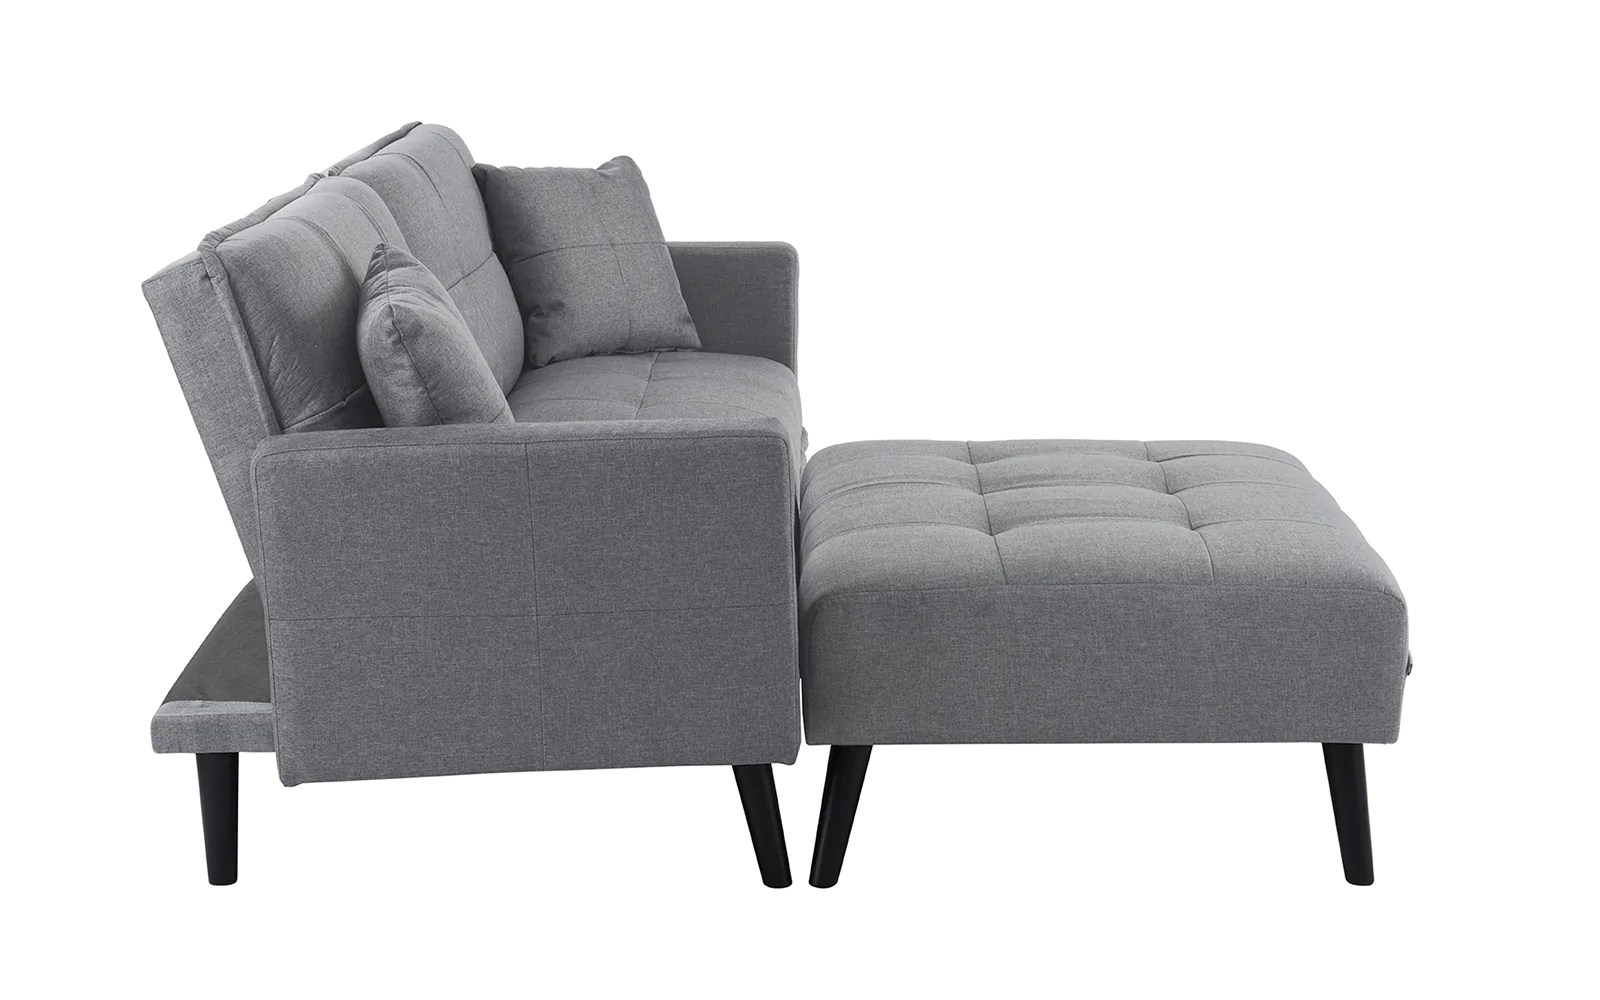 berwick mid century sleeper sofa nottingham makers madison linen sofamania